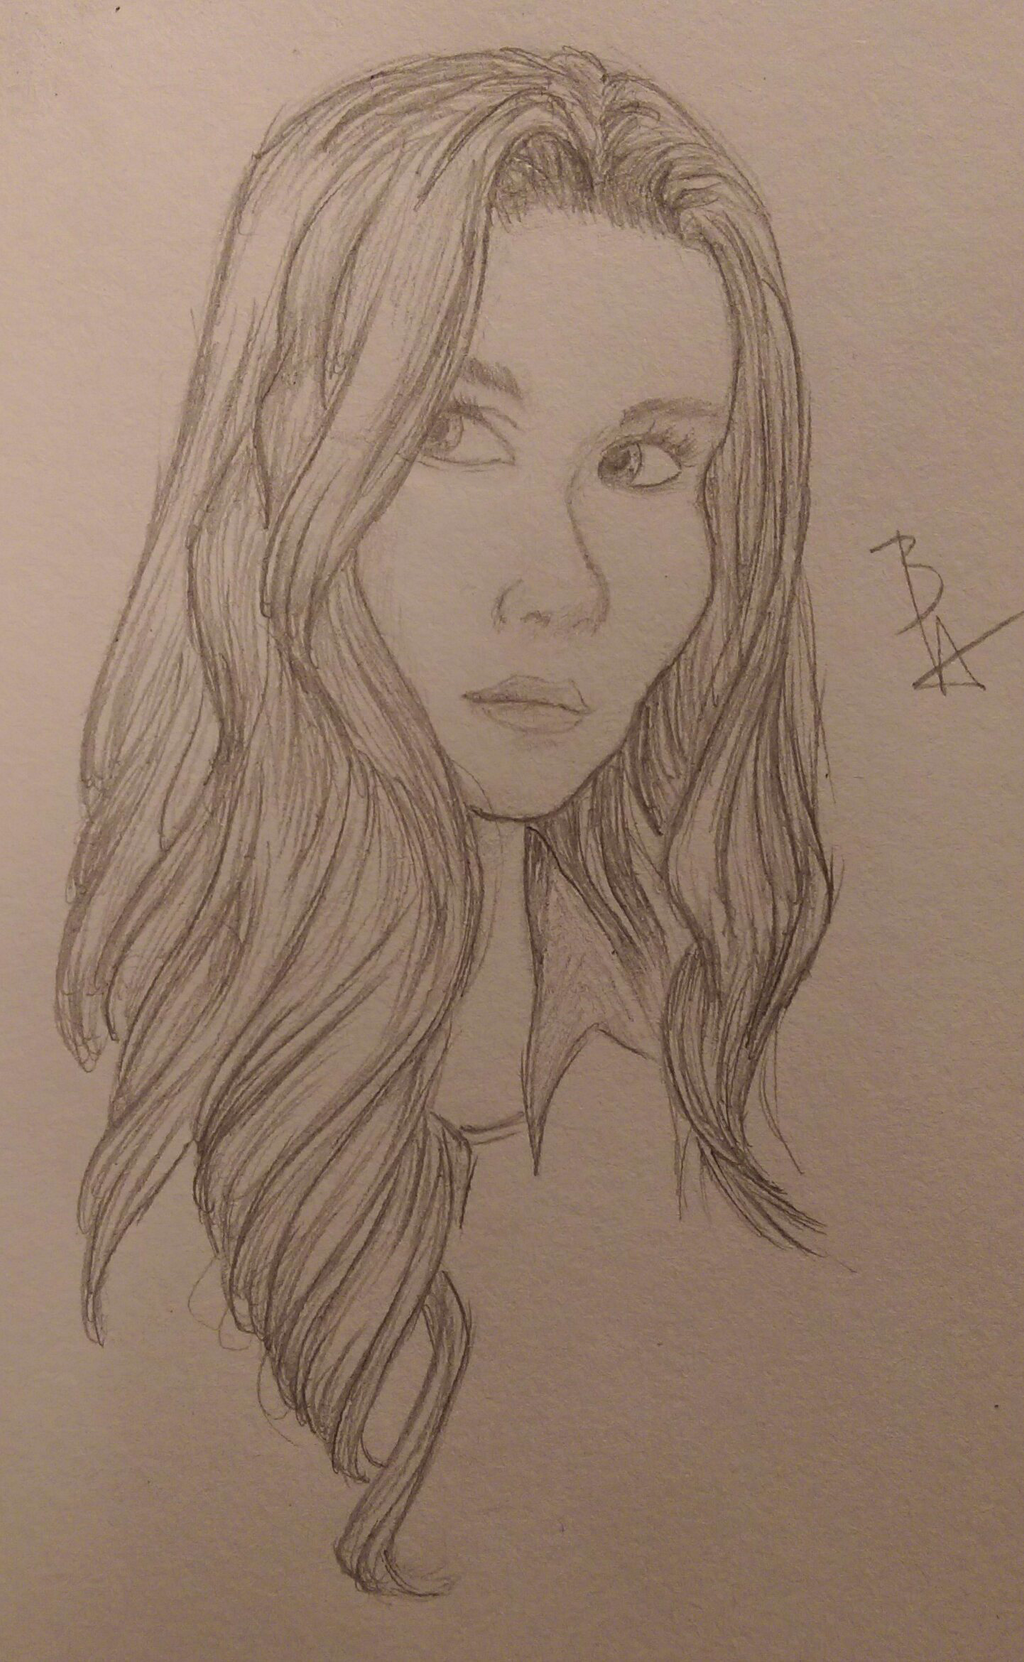 Veronica by XxRoset-828xX